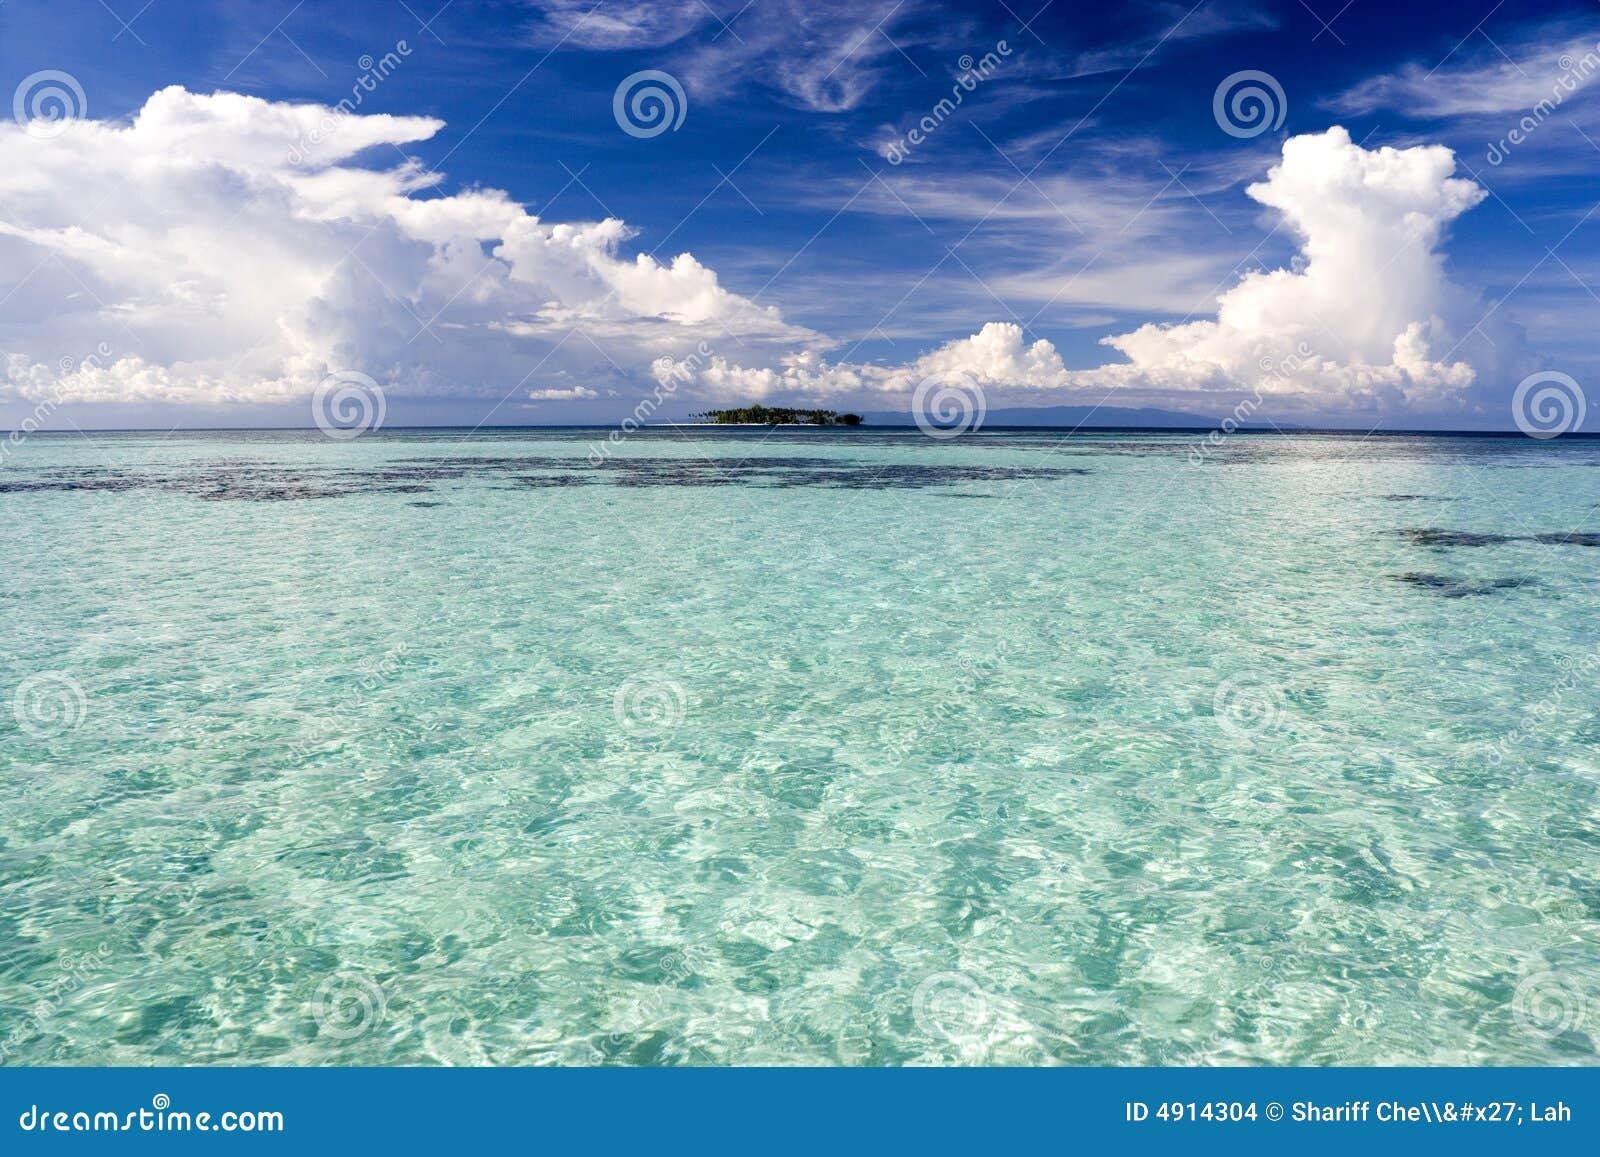 Shallow Open Sea